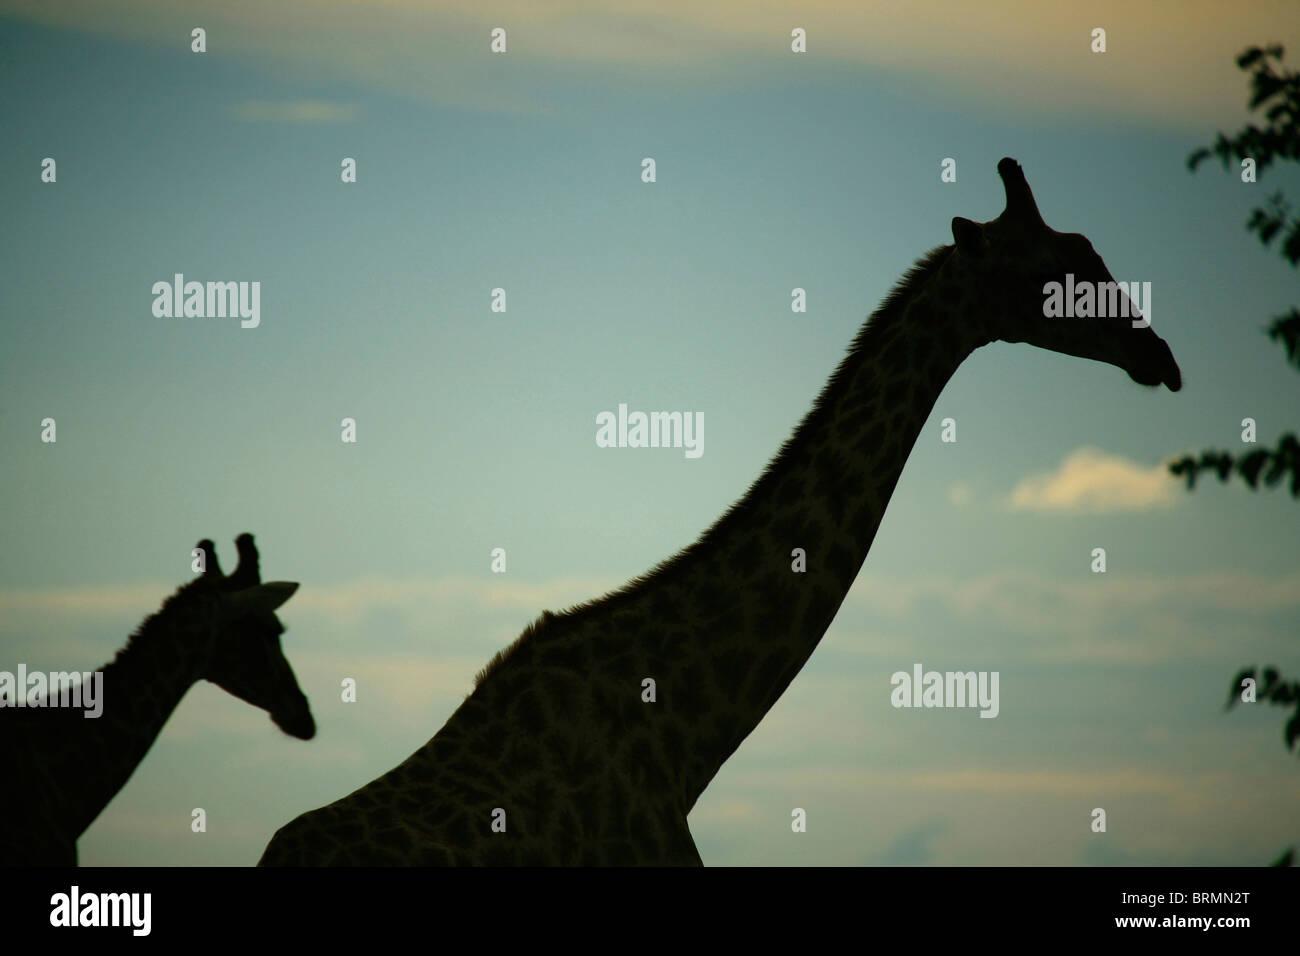 Giraffe silhouetted at sunset - Stock Image